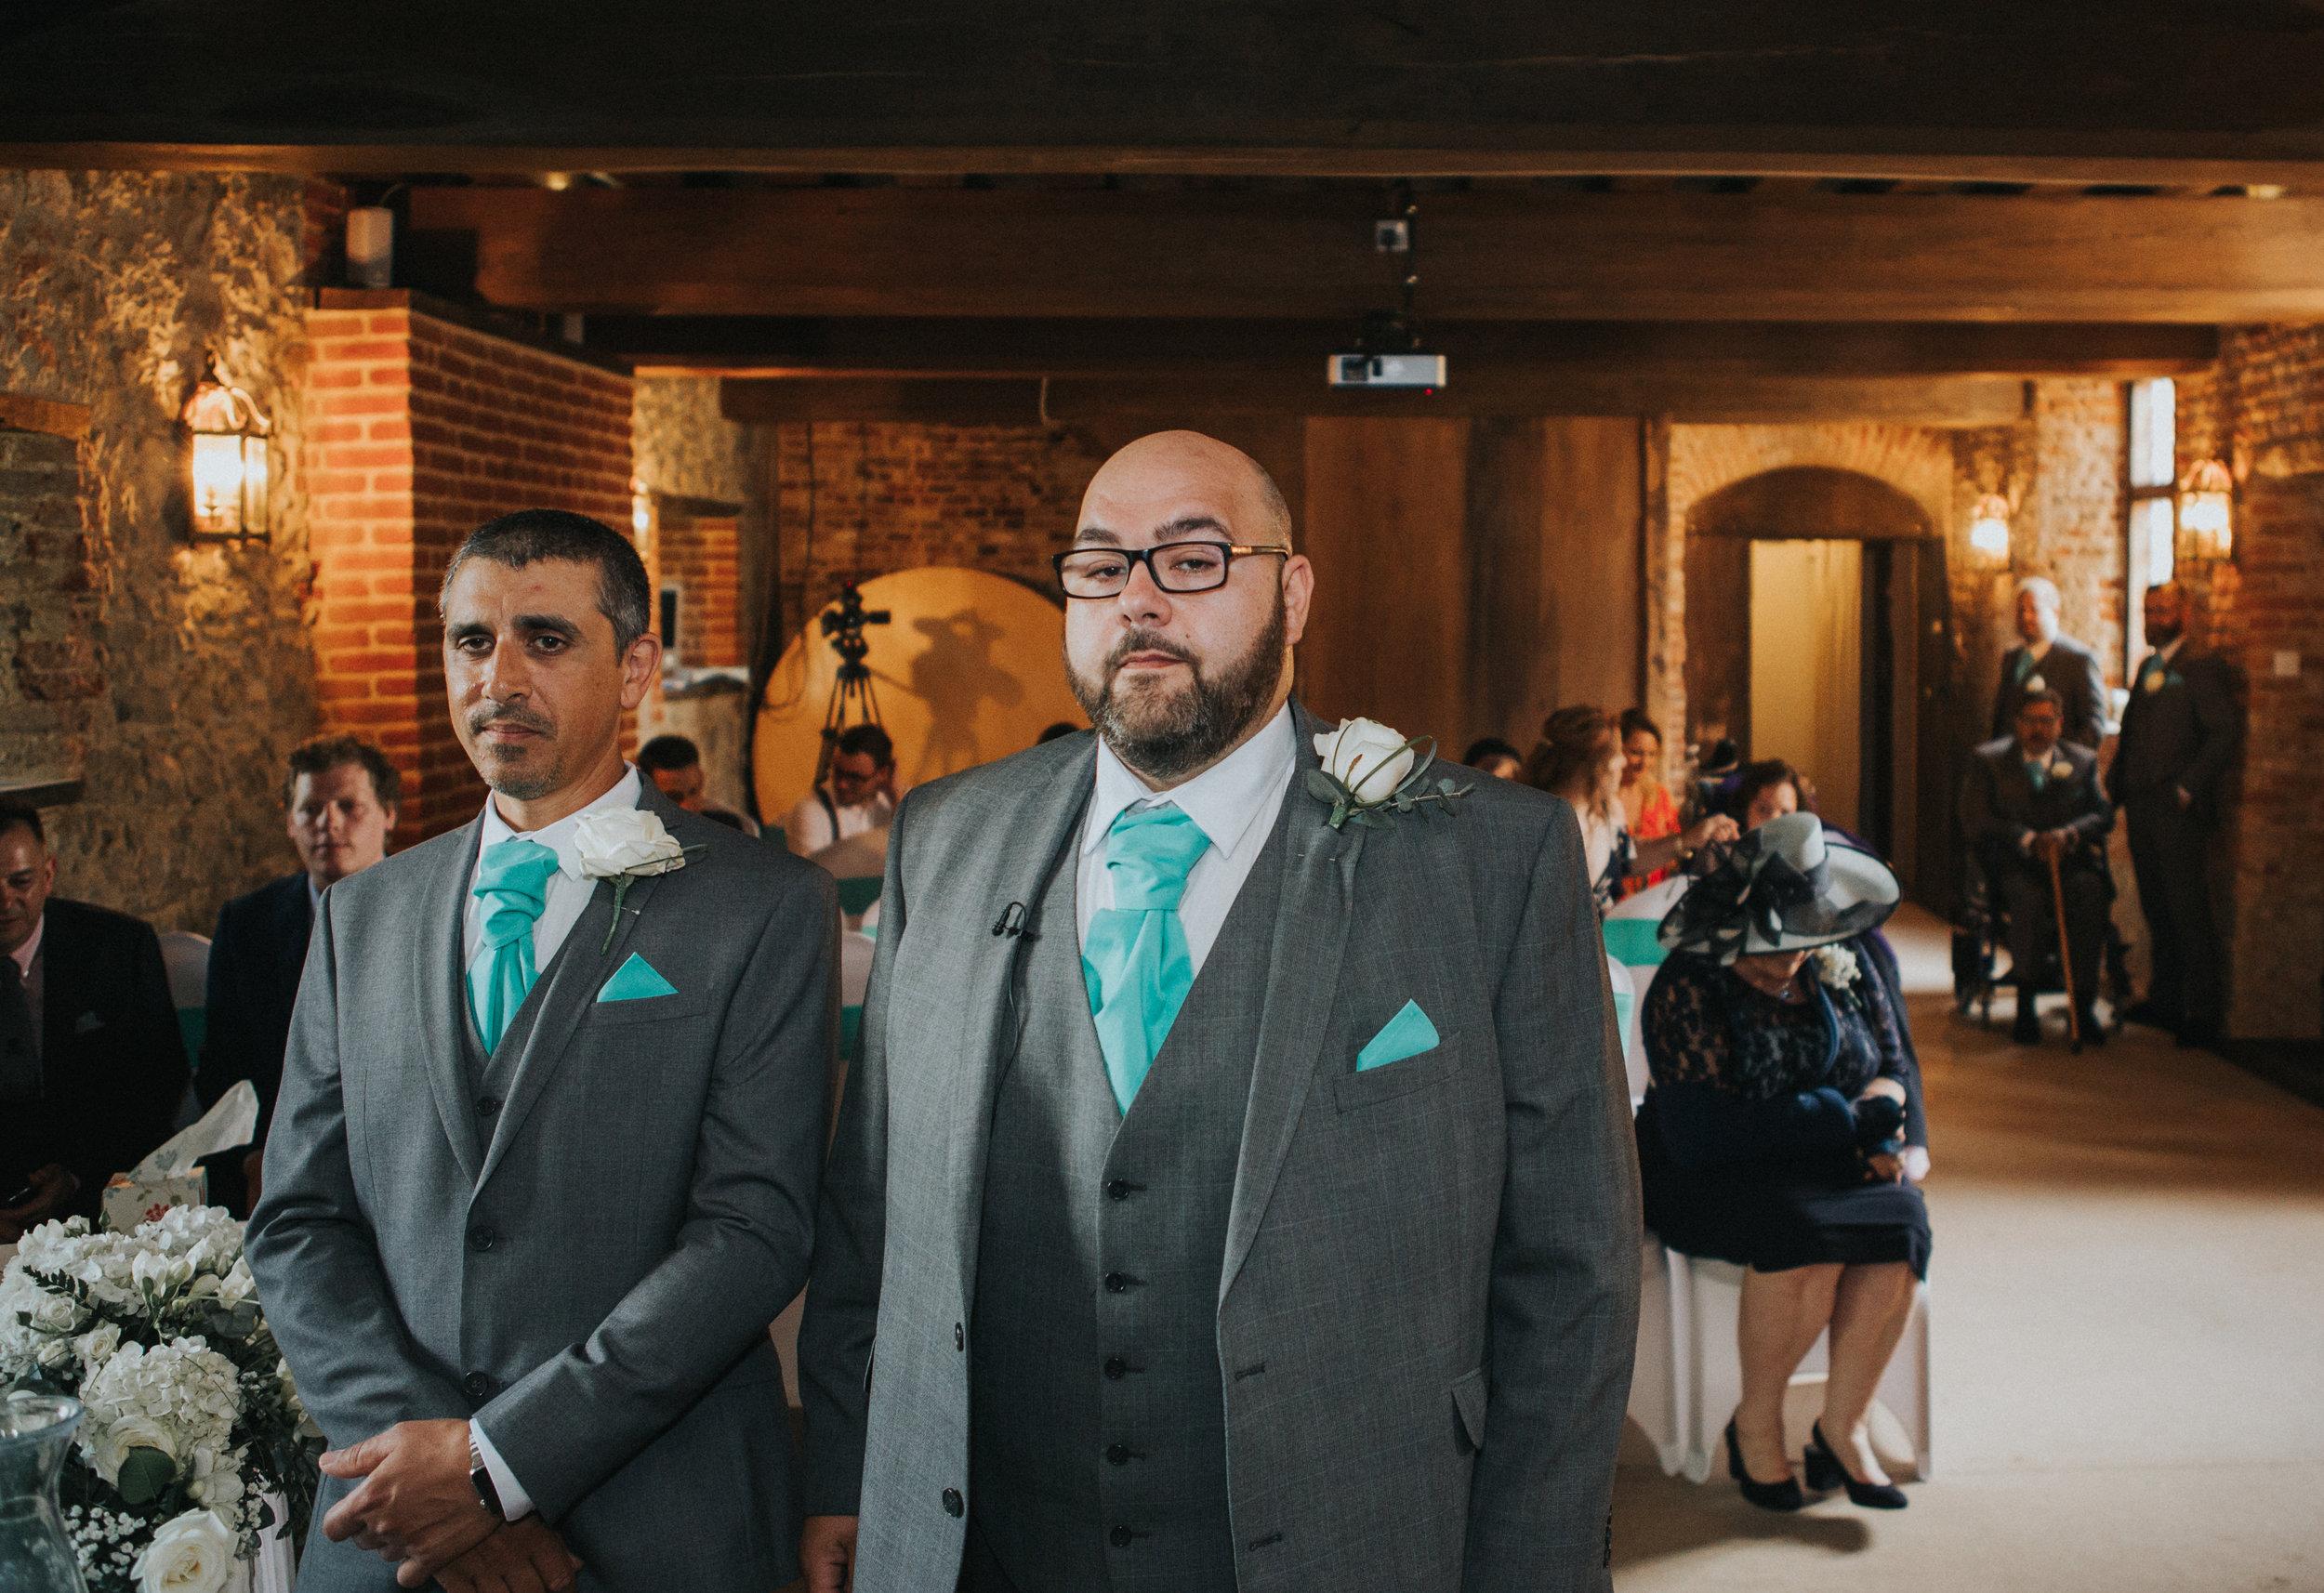 westenhangar-castle-kent-london-wedding-photography-groom-aisle-wait-34